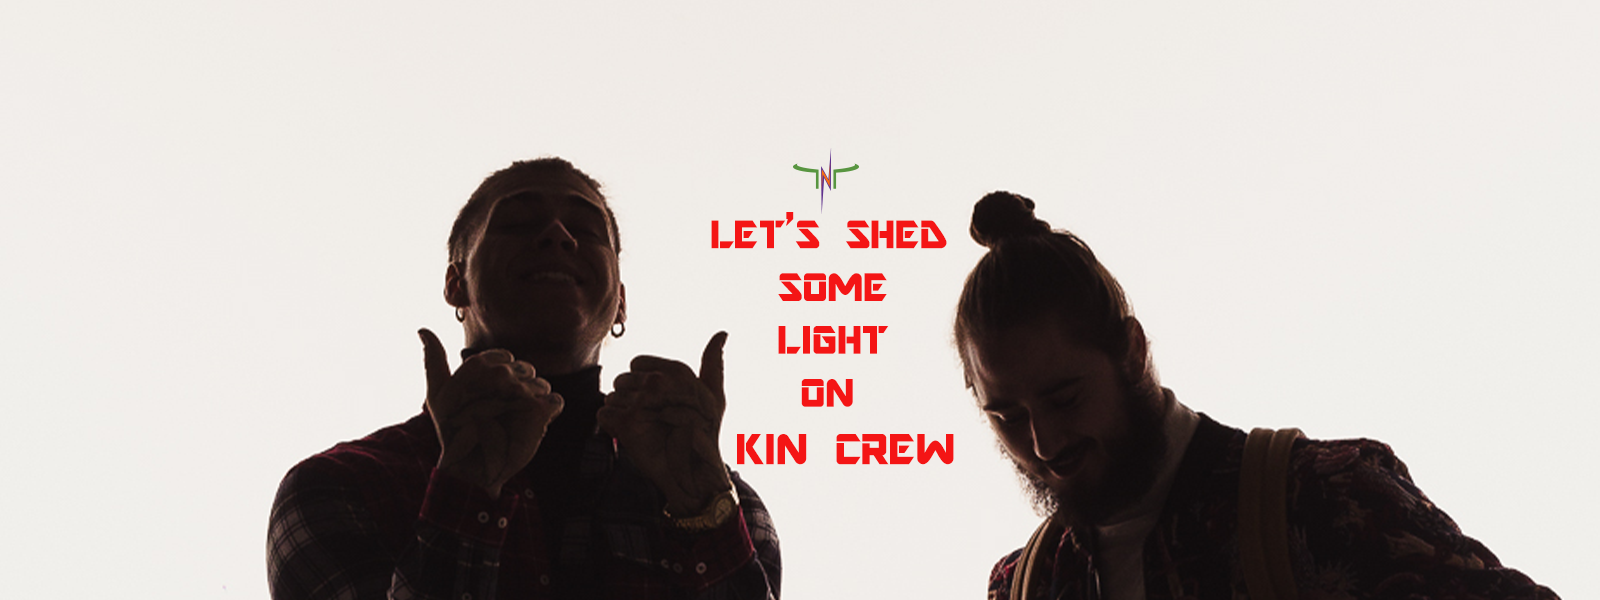 Kin Crew-IJNY WITH BRDGS featured in Teens Now Talk magazine